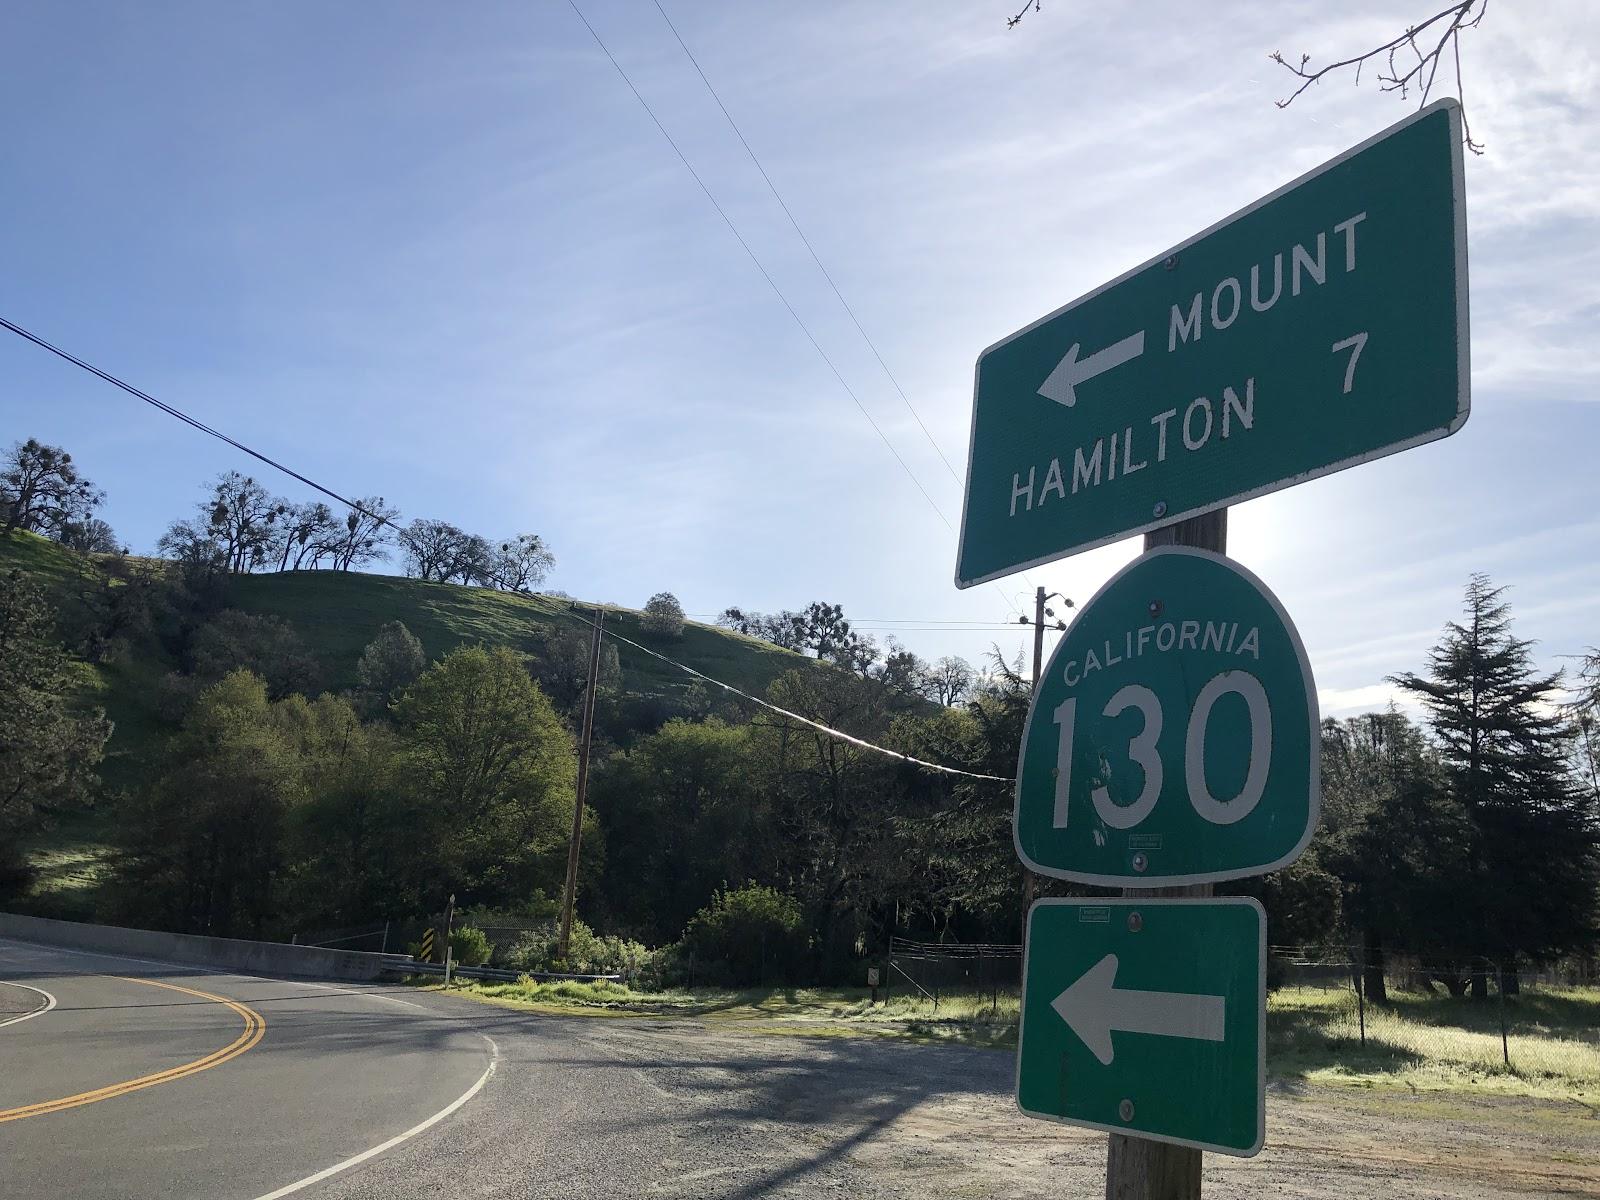 Bike climb Mt. Hamilton  West - start of second climb - Hwy 130 road sign